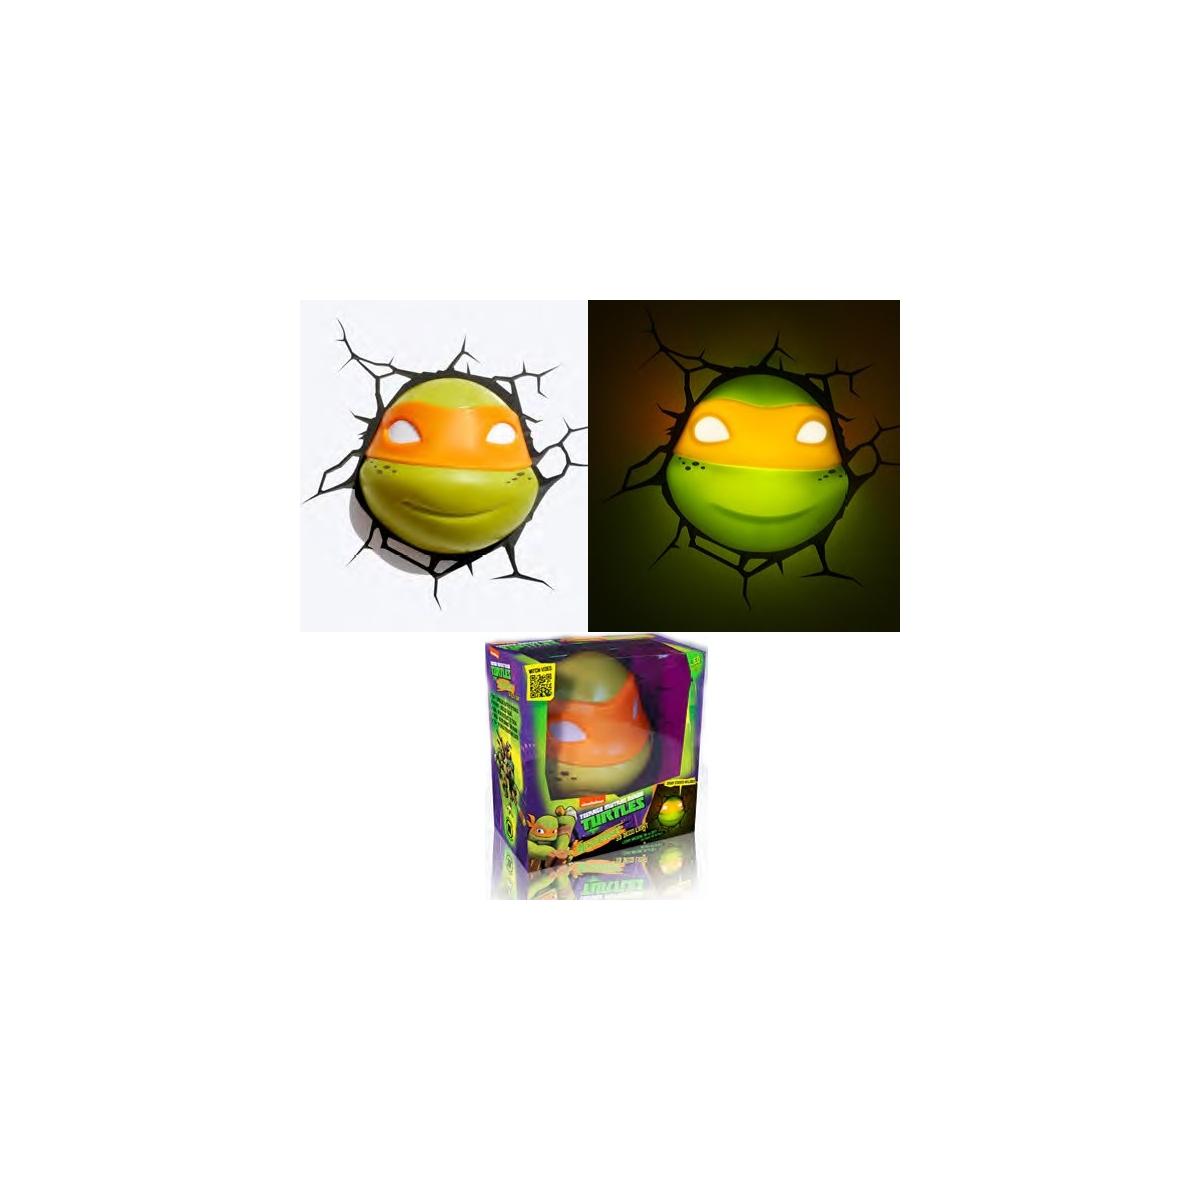 Tortues ninja lampe d corative 3d michelangelo - Tortues ninja michelangelo ...